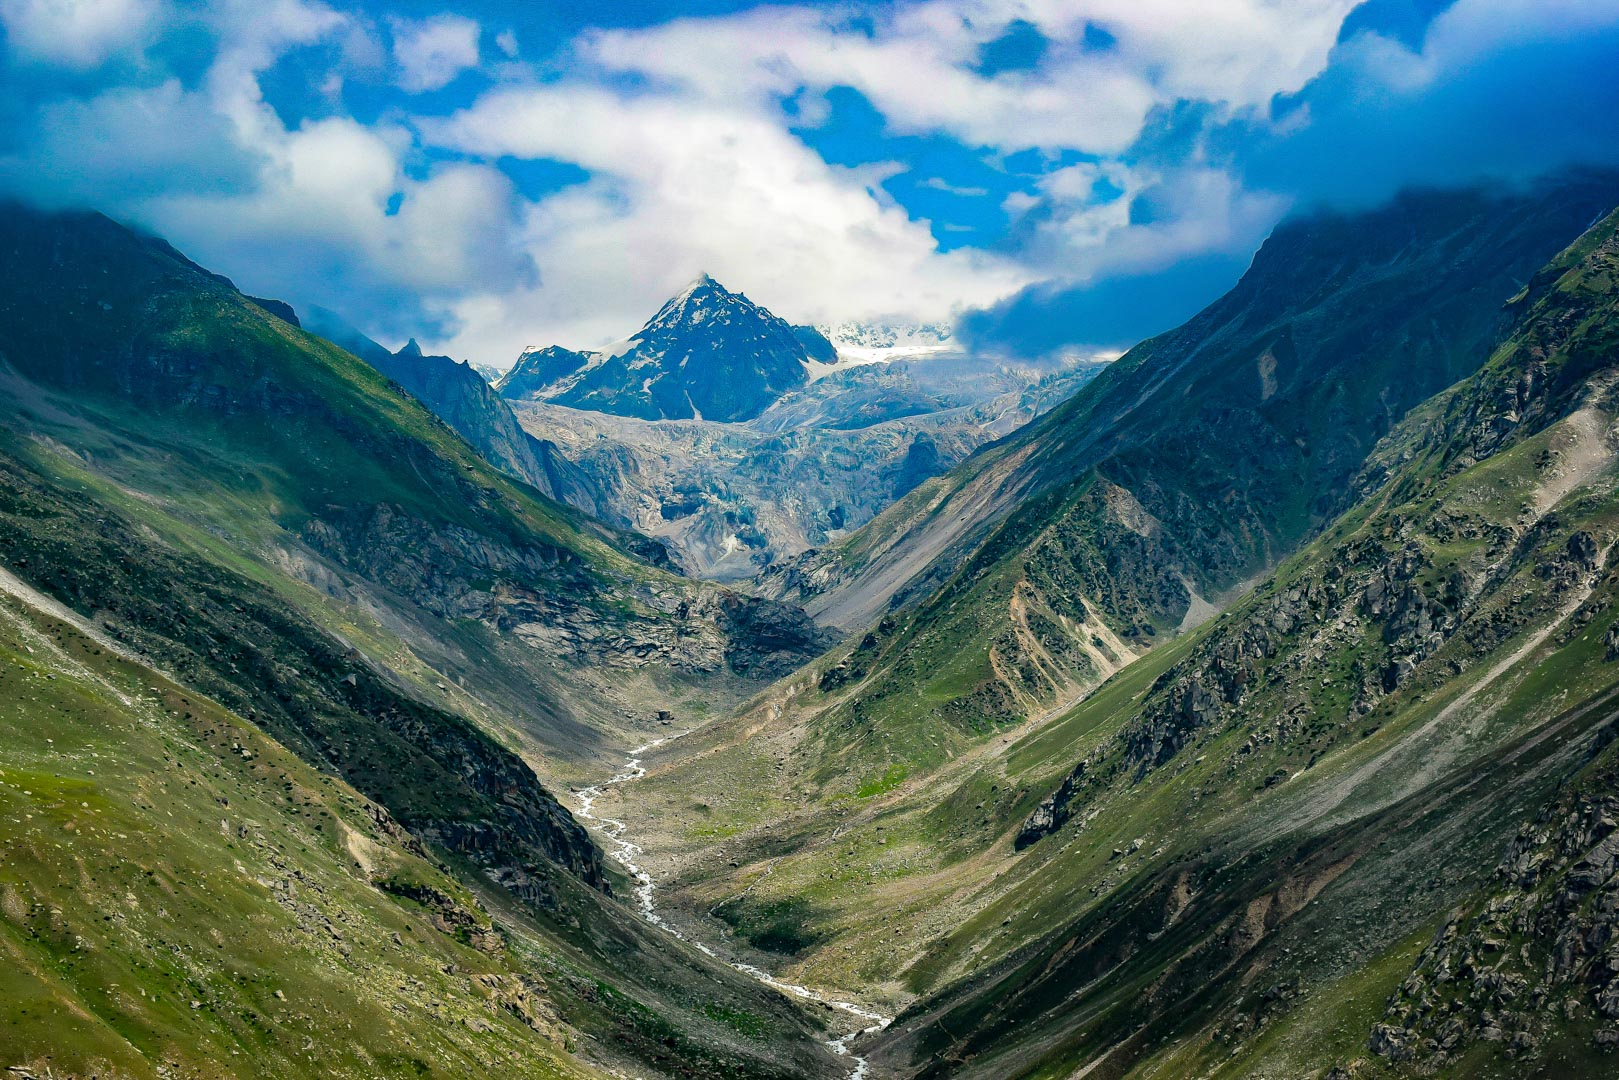 A short guide to Chadar Trek